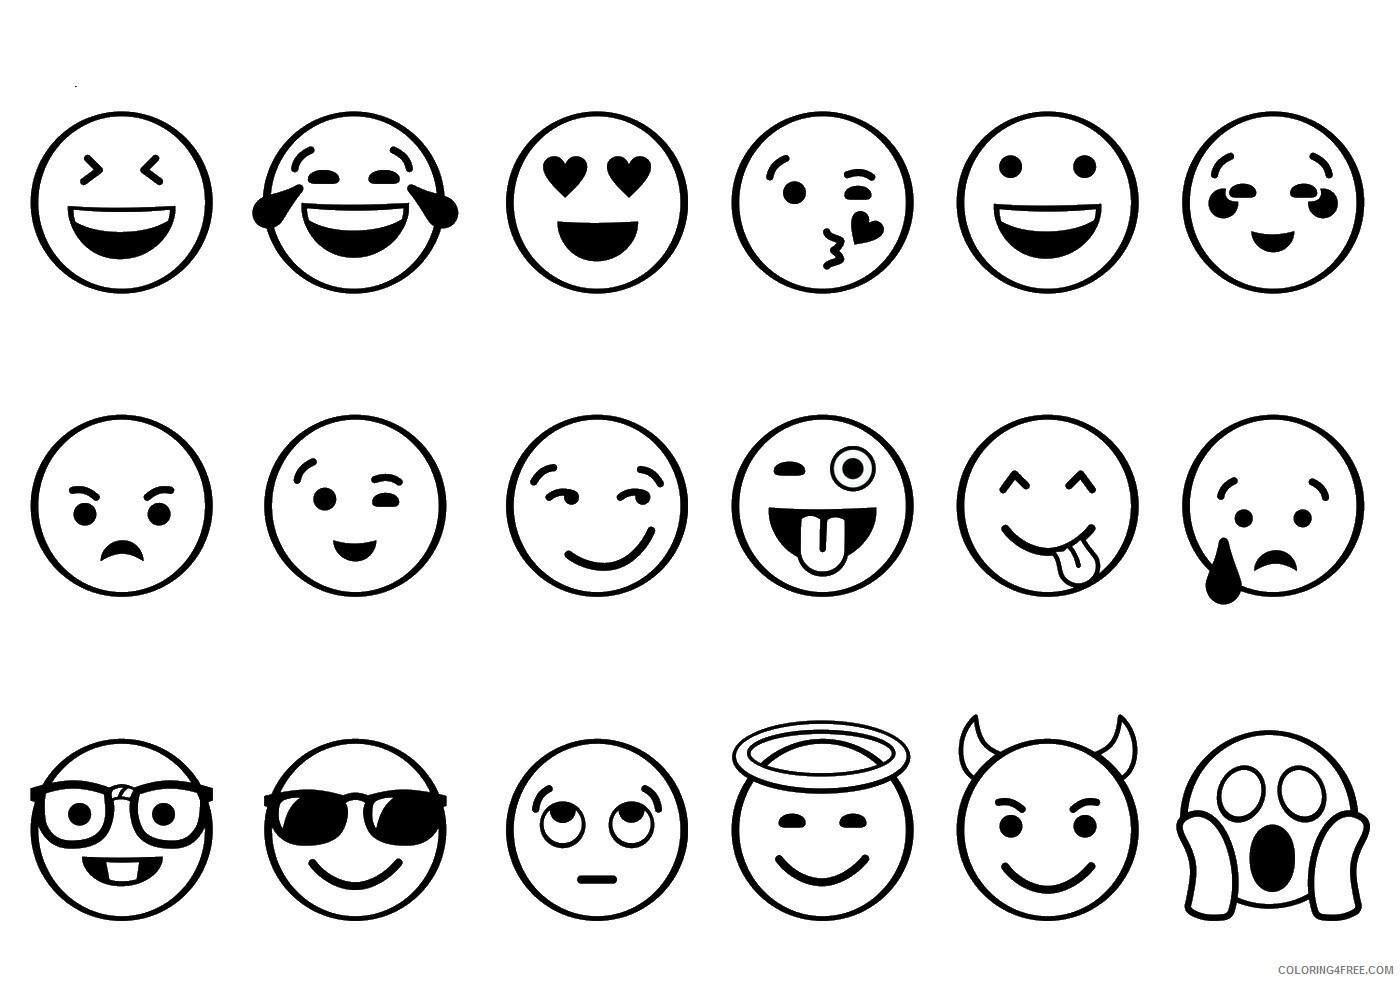 Emoji Coloring Pages emoji5 Printable 2021 2170 Coloring4free